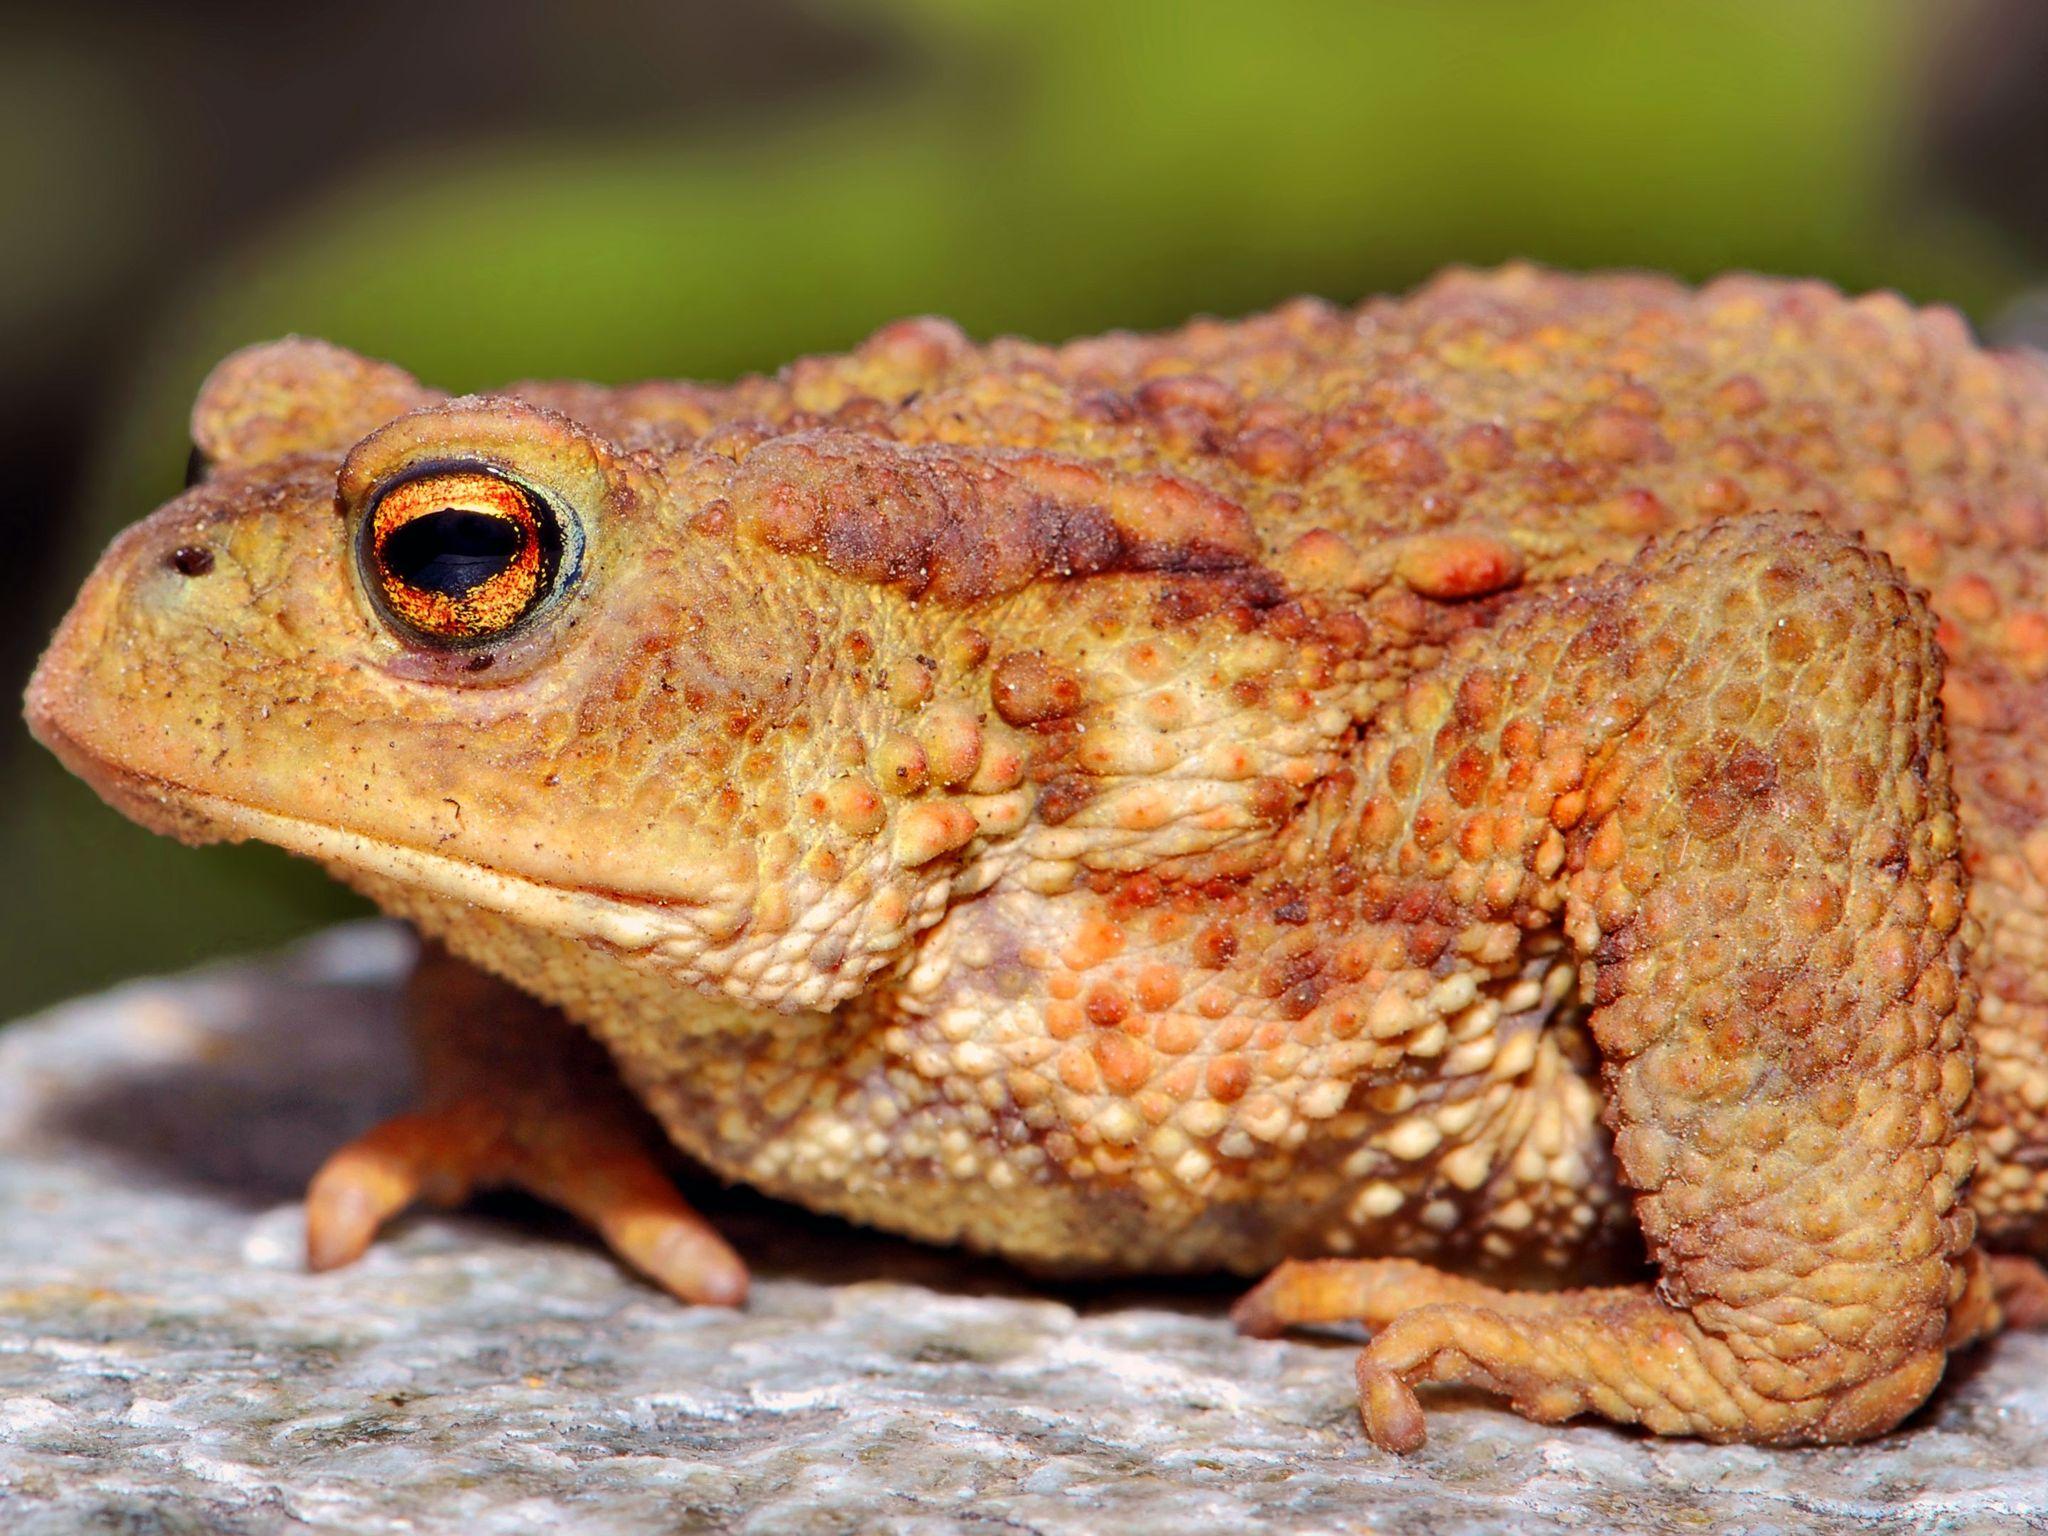 жаба рапуха фото крепятся